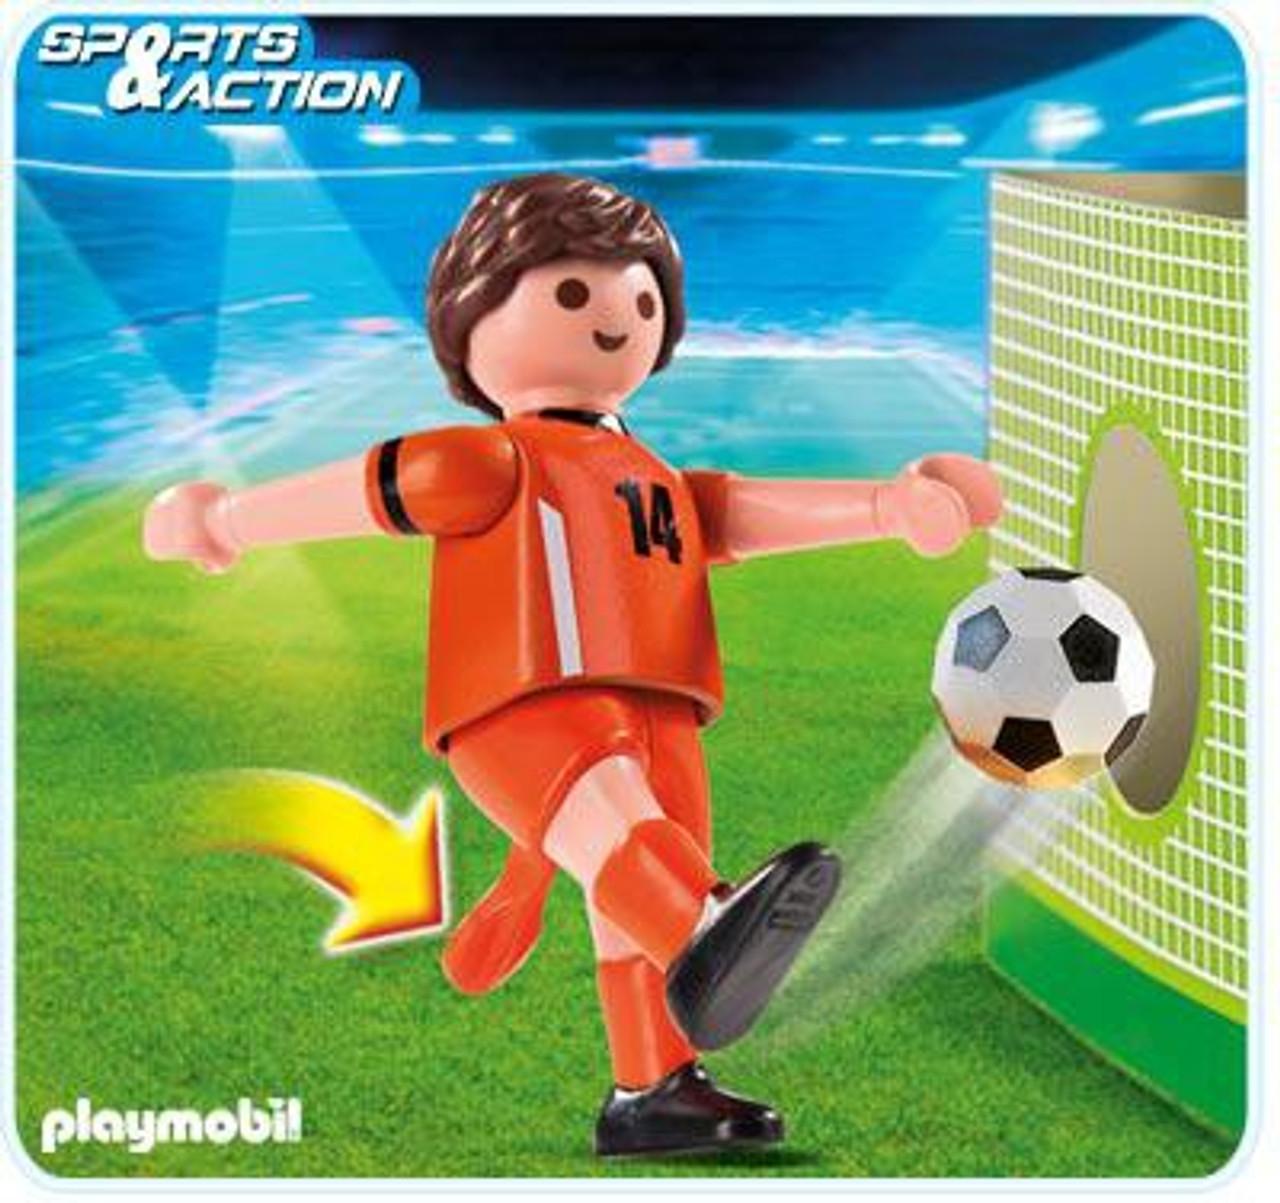 Playmobil Sports & Action Netherlands Set #4735